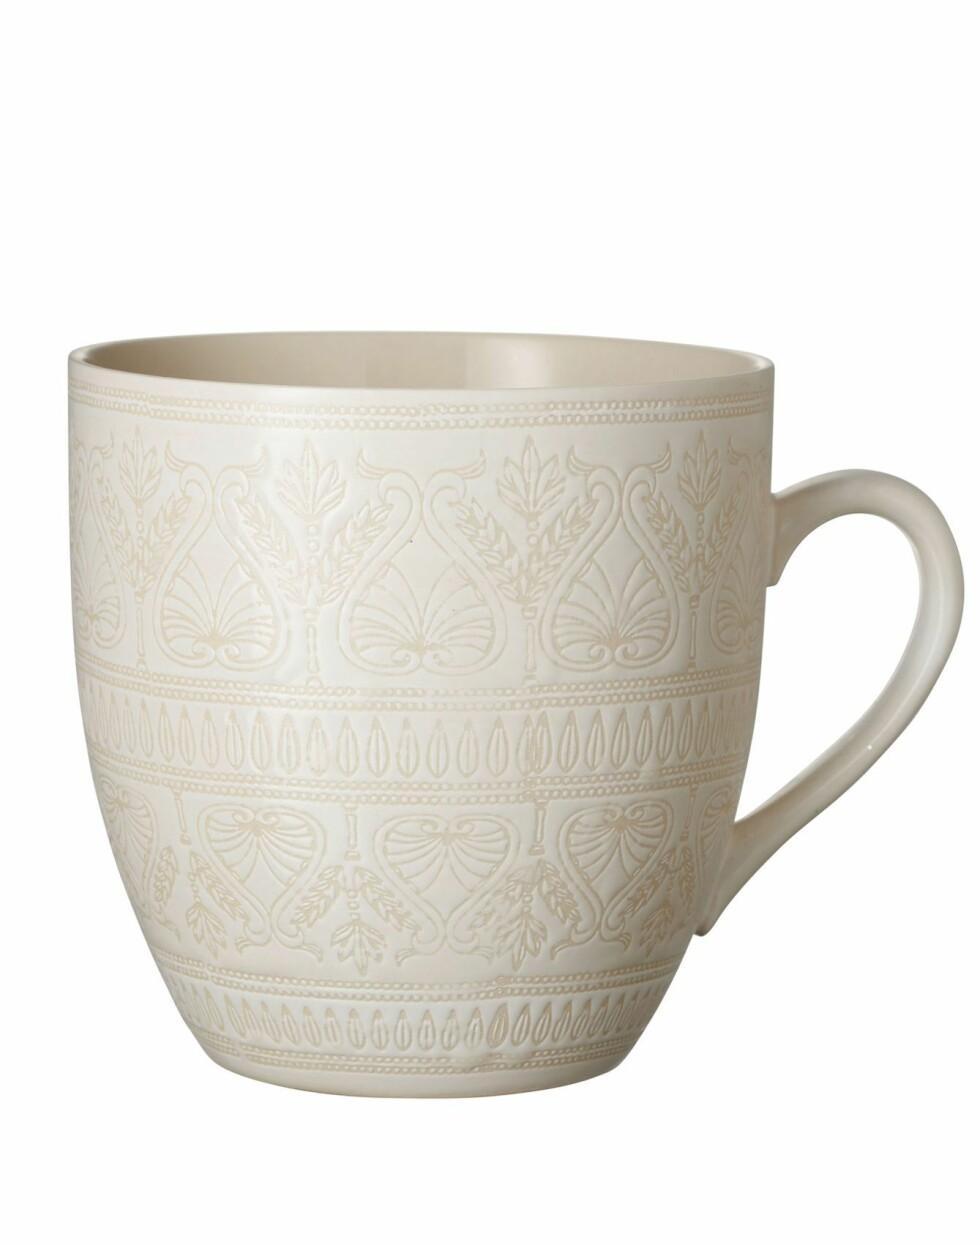 Krus fra Indiska  99,-  https://indiska.com/no/Interi%C3%B8r/Glass-%26-porselen/krus-og-boller/XL-MUG/p/1000008117105